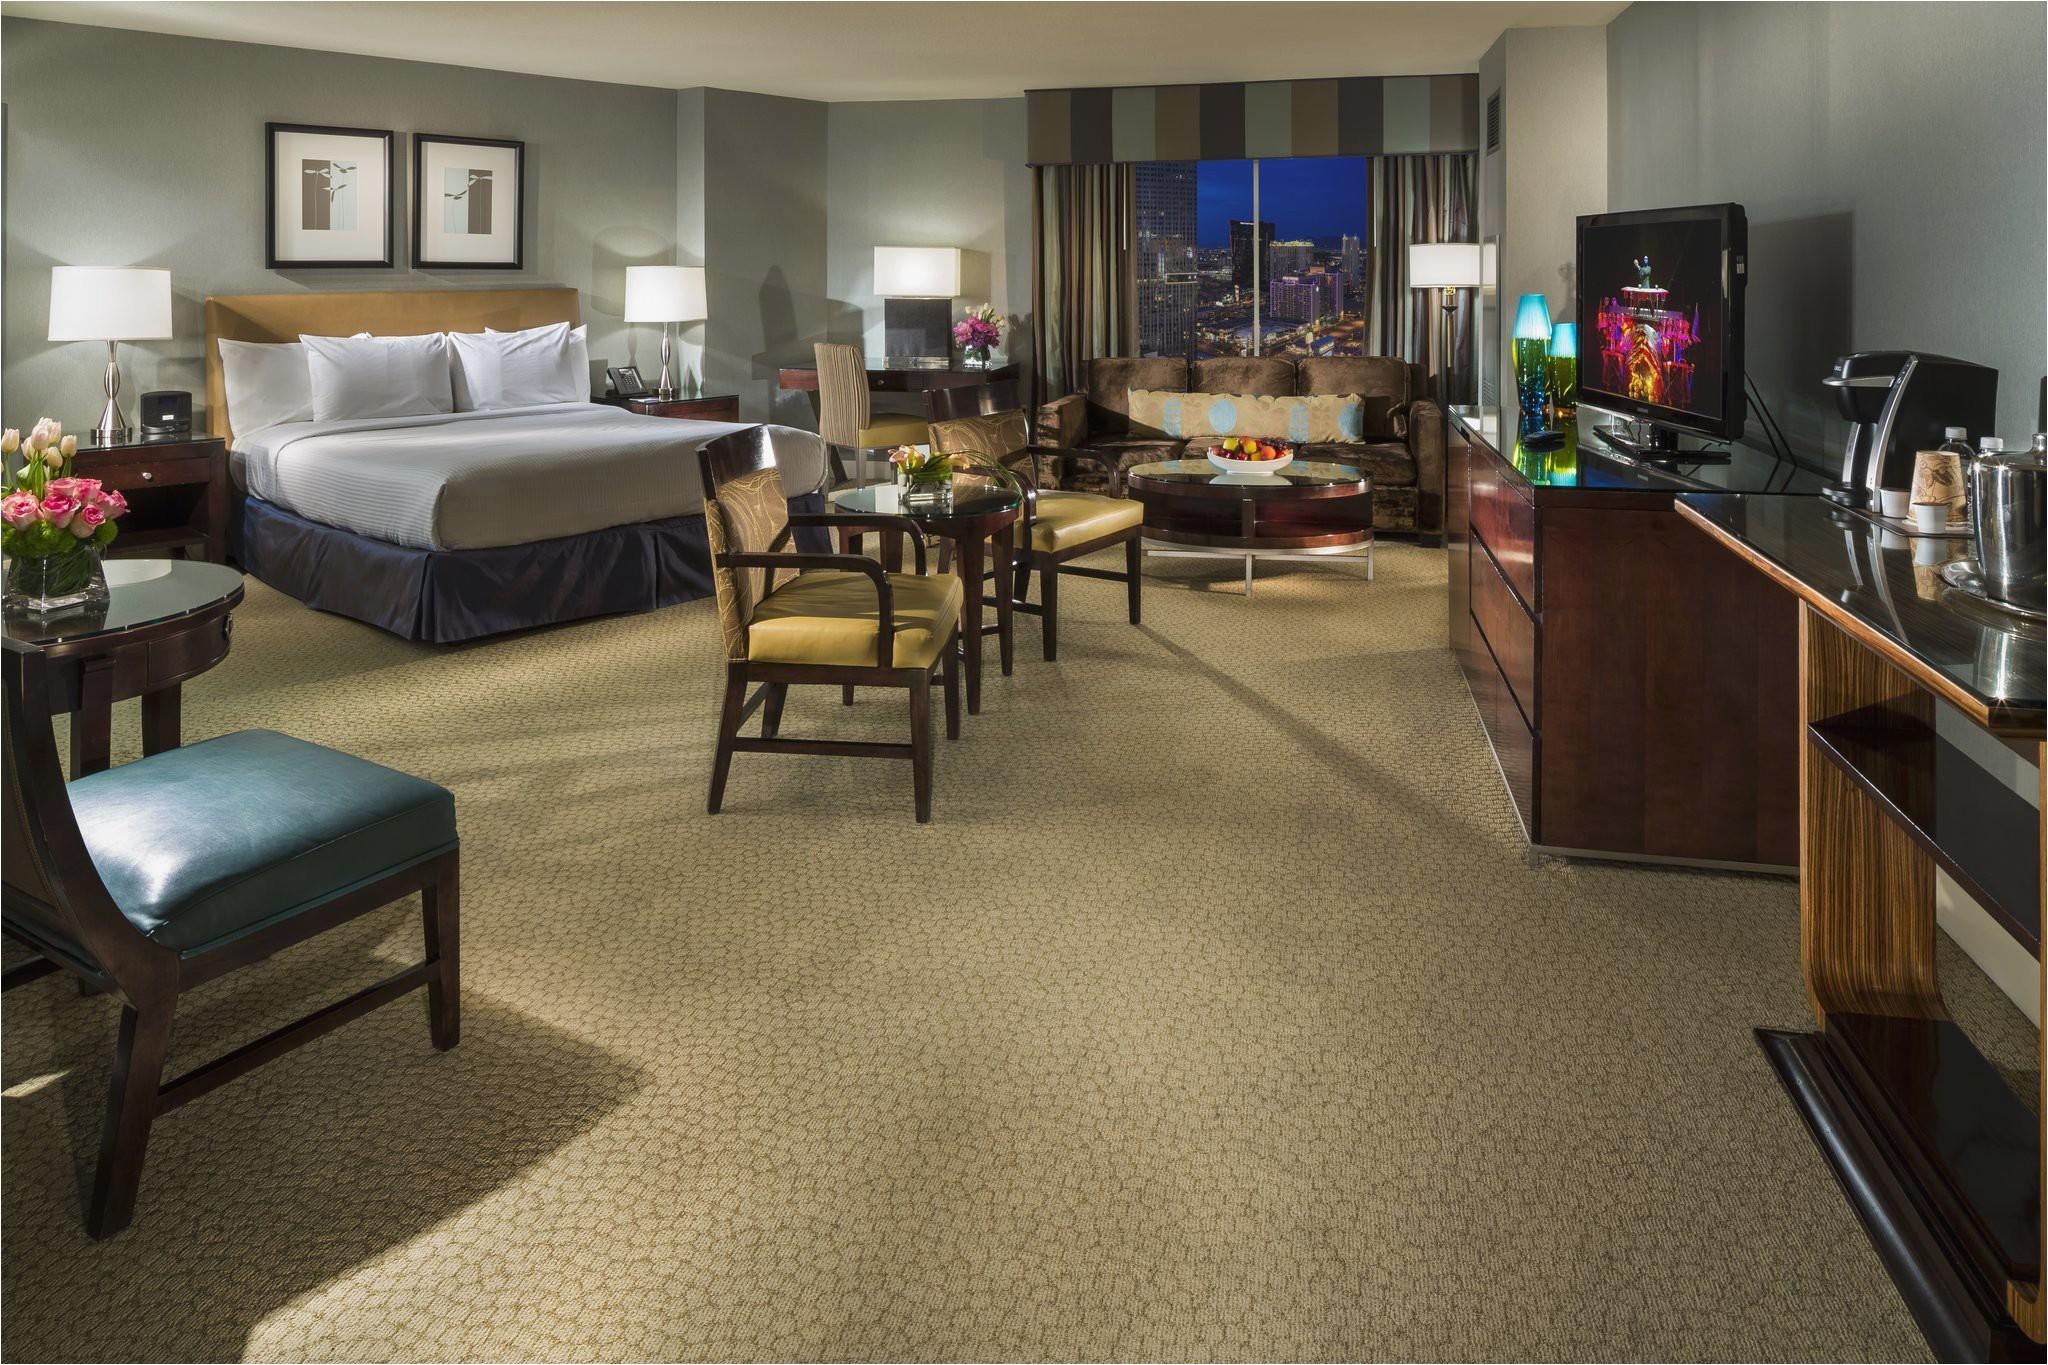 bedroom fresh 2 bedroom apartments for rent bridgeport ct images home design best and home